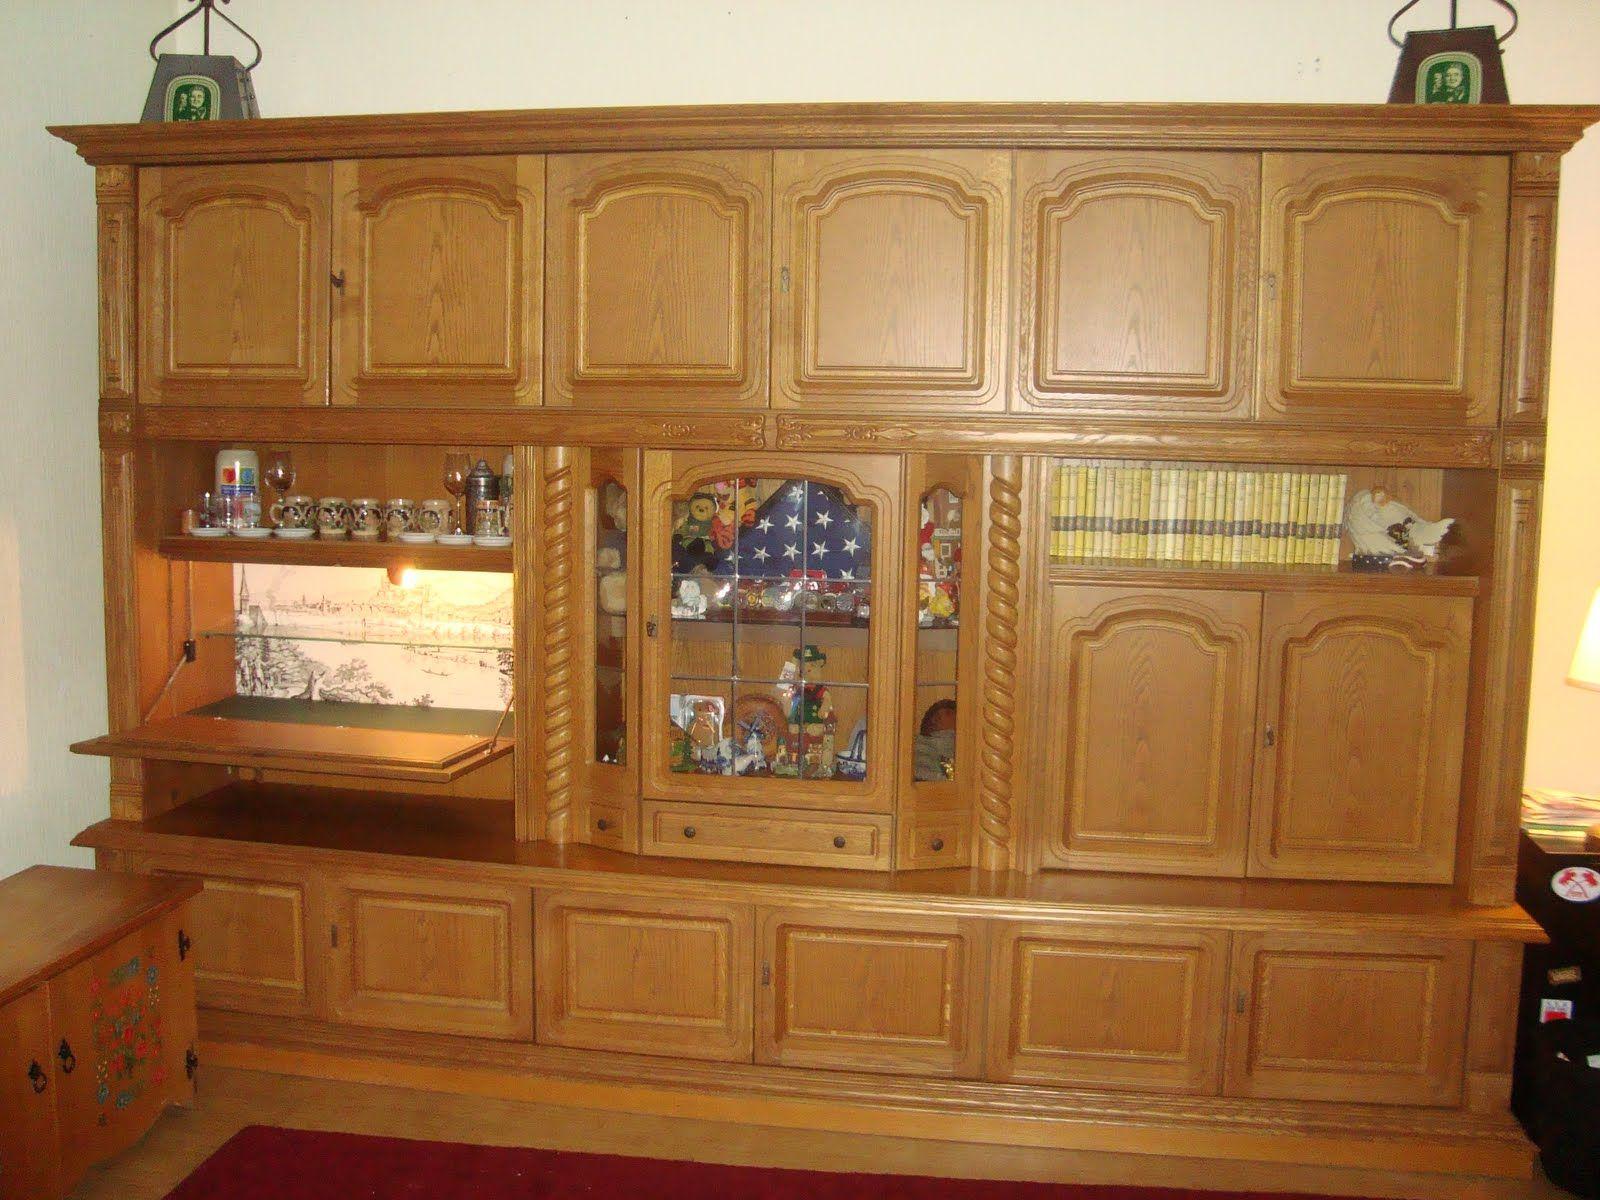 German Shrunk Furniture For The Home Pinterest